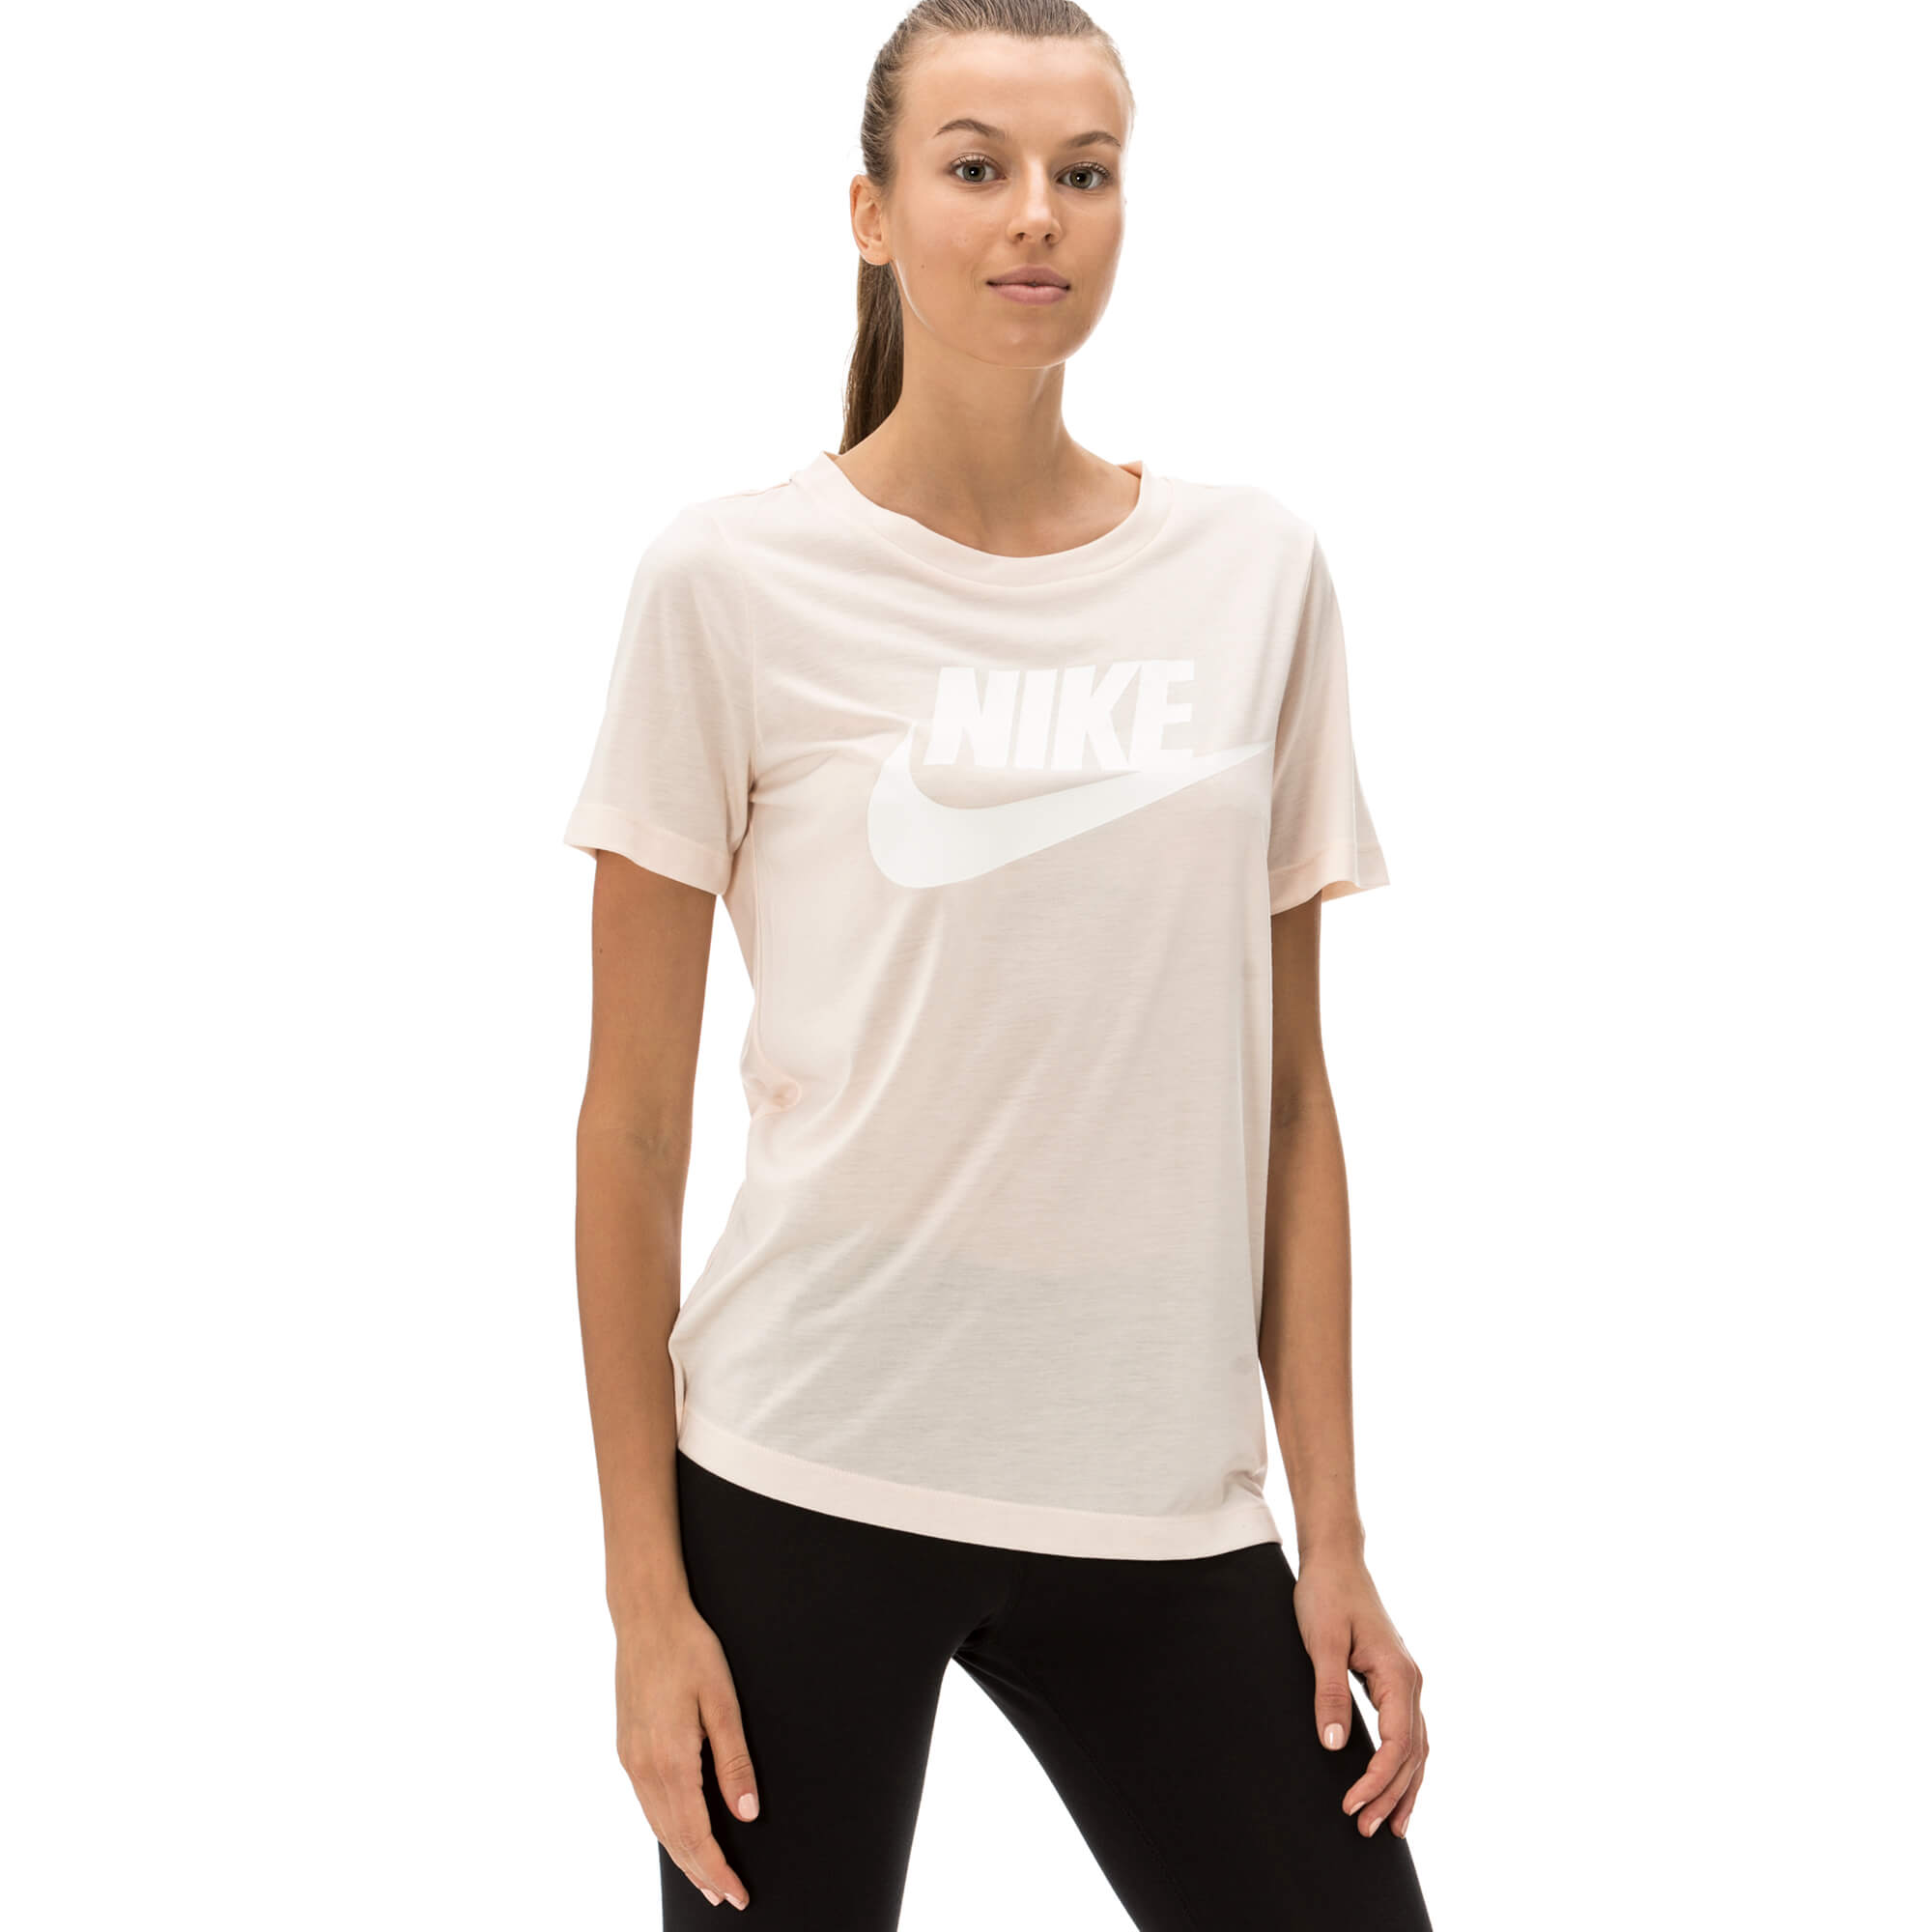 Nike Essential Kadın Bej T-shirt